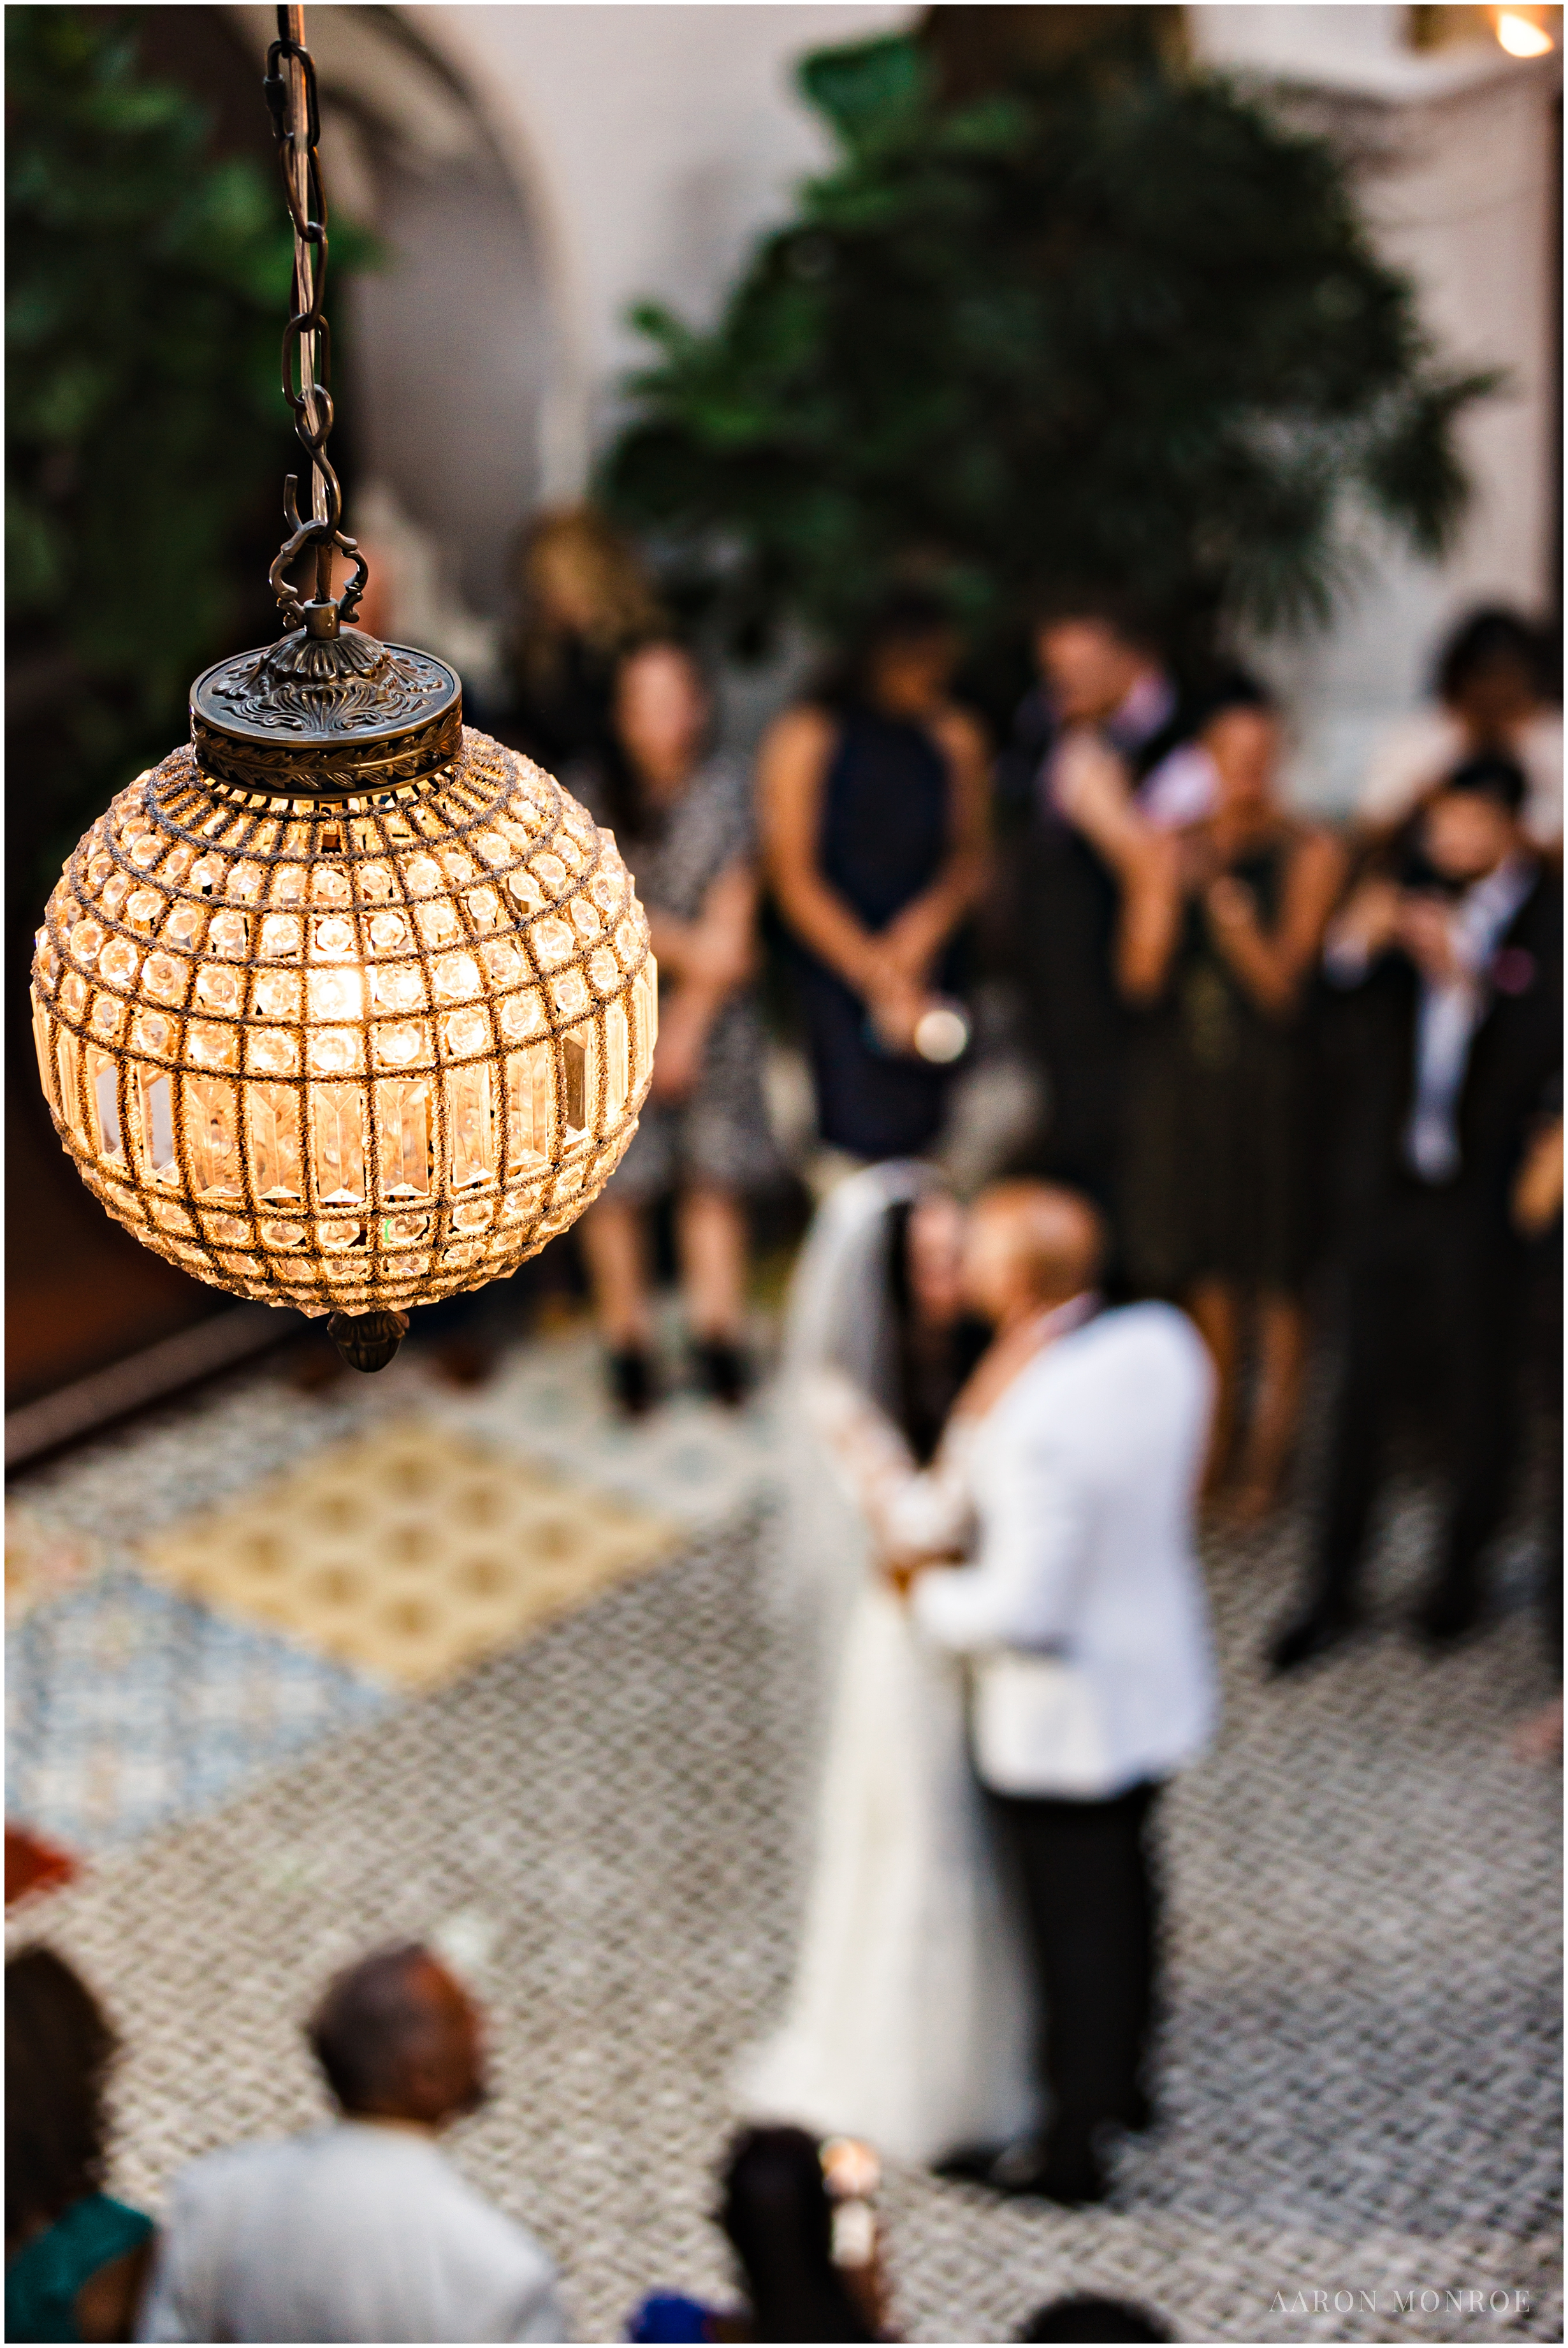 Ebell_Long_Beach_Wedding_Photography_0870.jpg